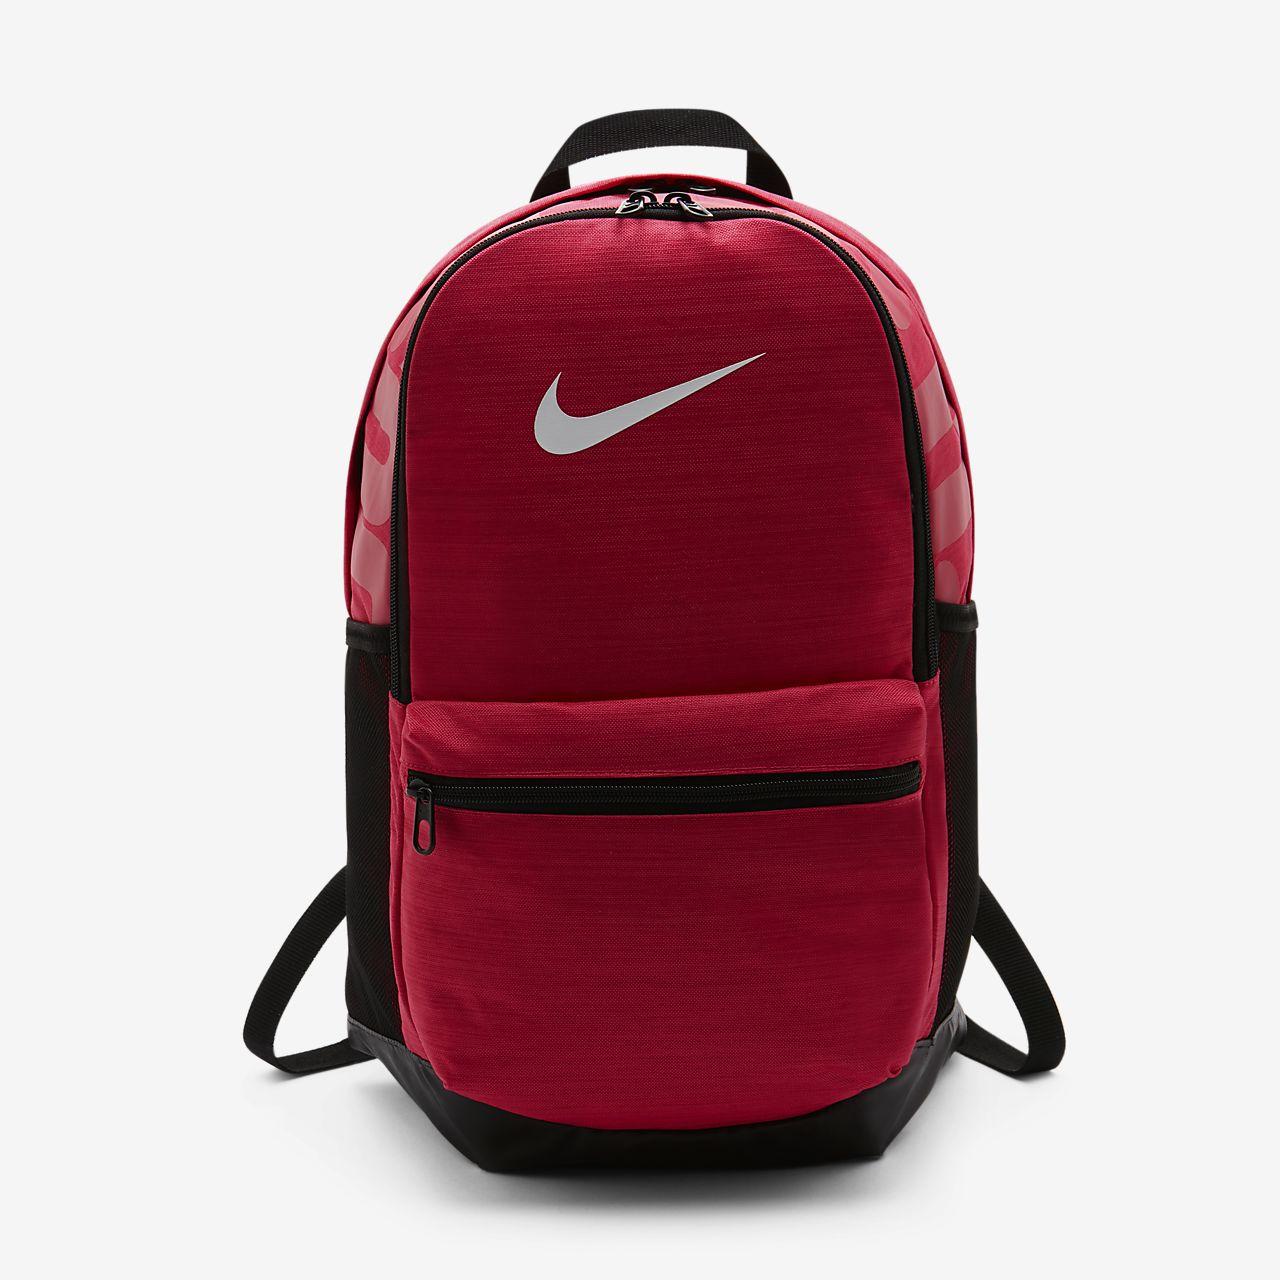 f2ddca0be Mochila de entrenamiento Nike Brasilia (mediana). Nike.com MX